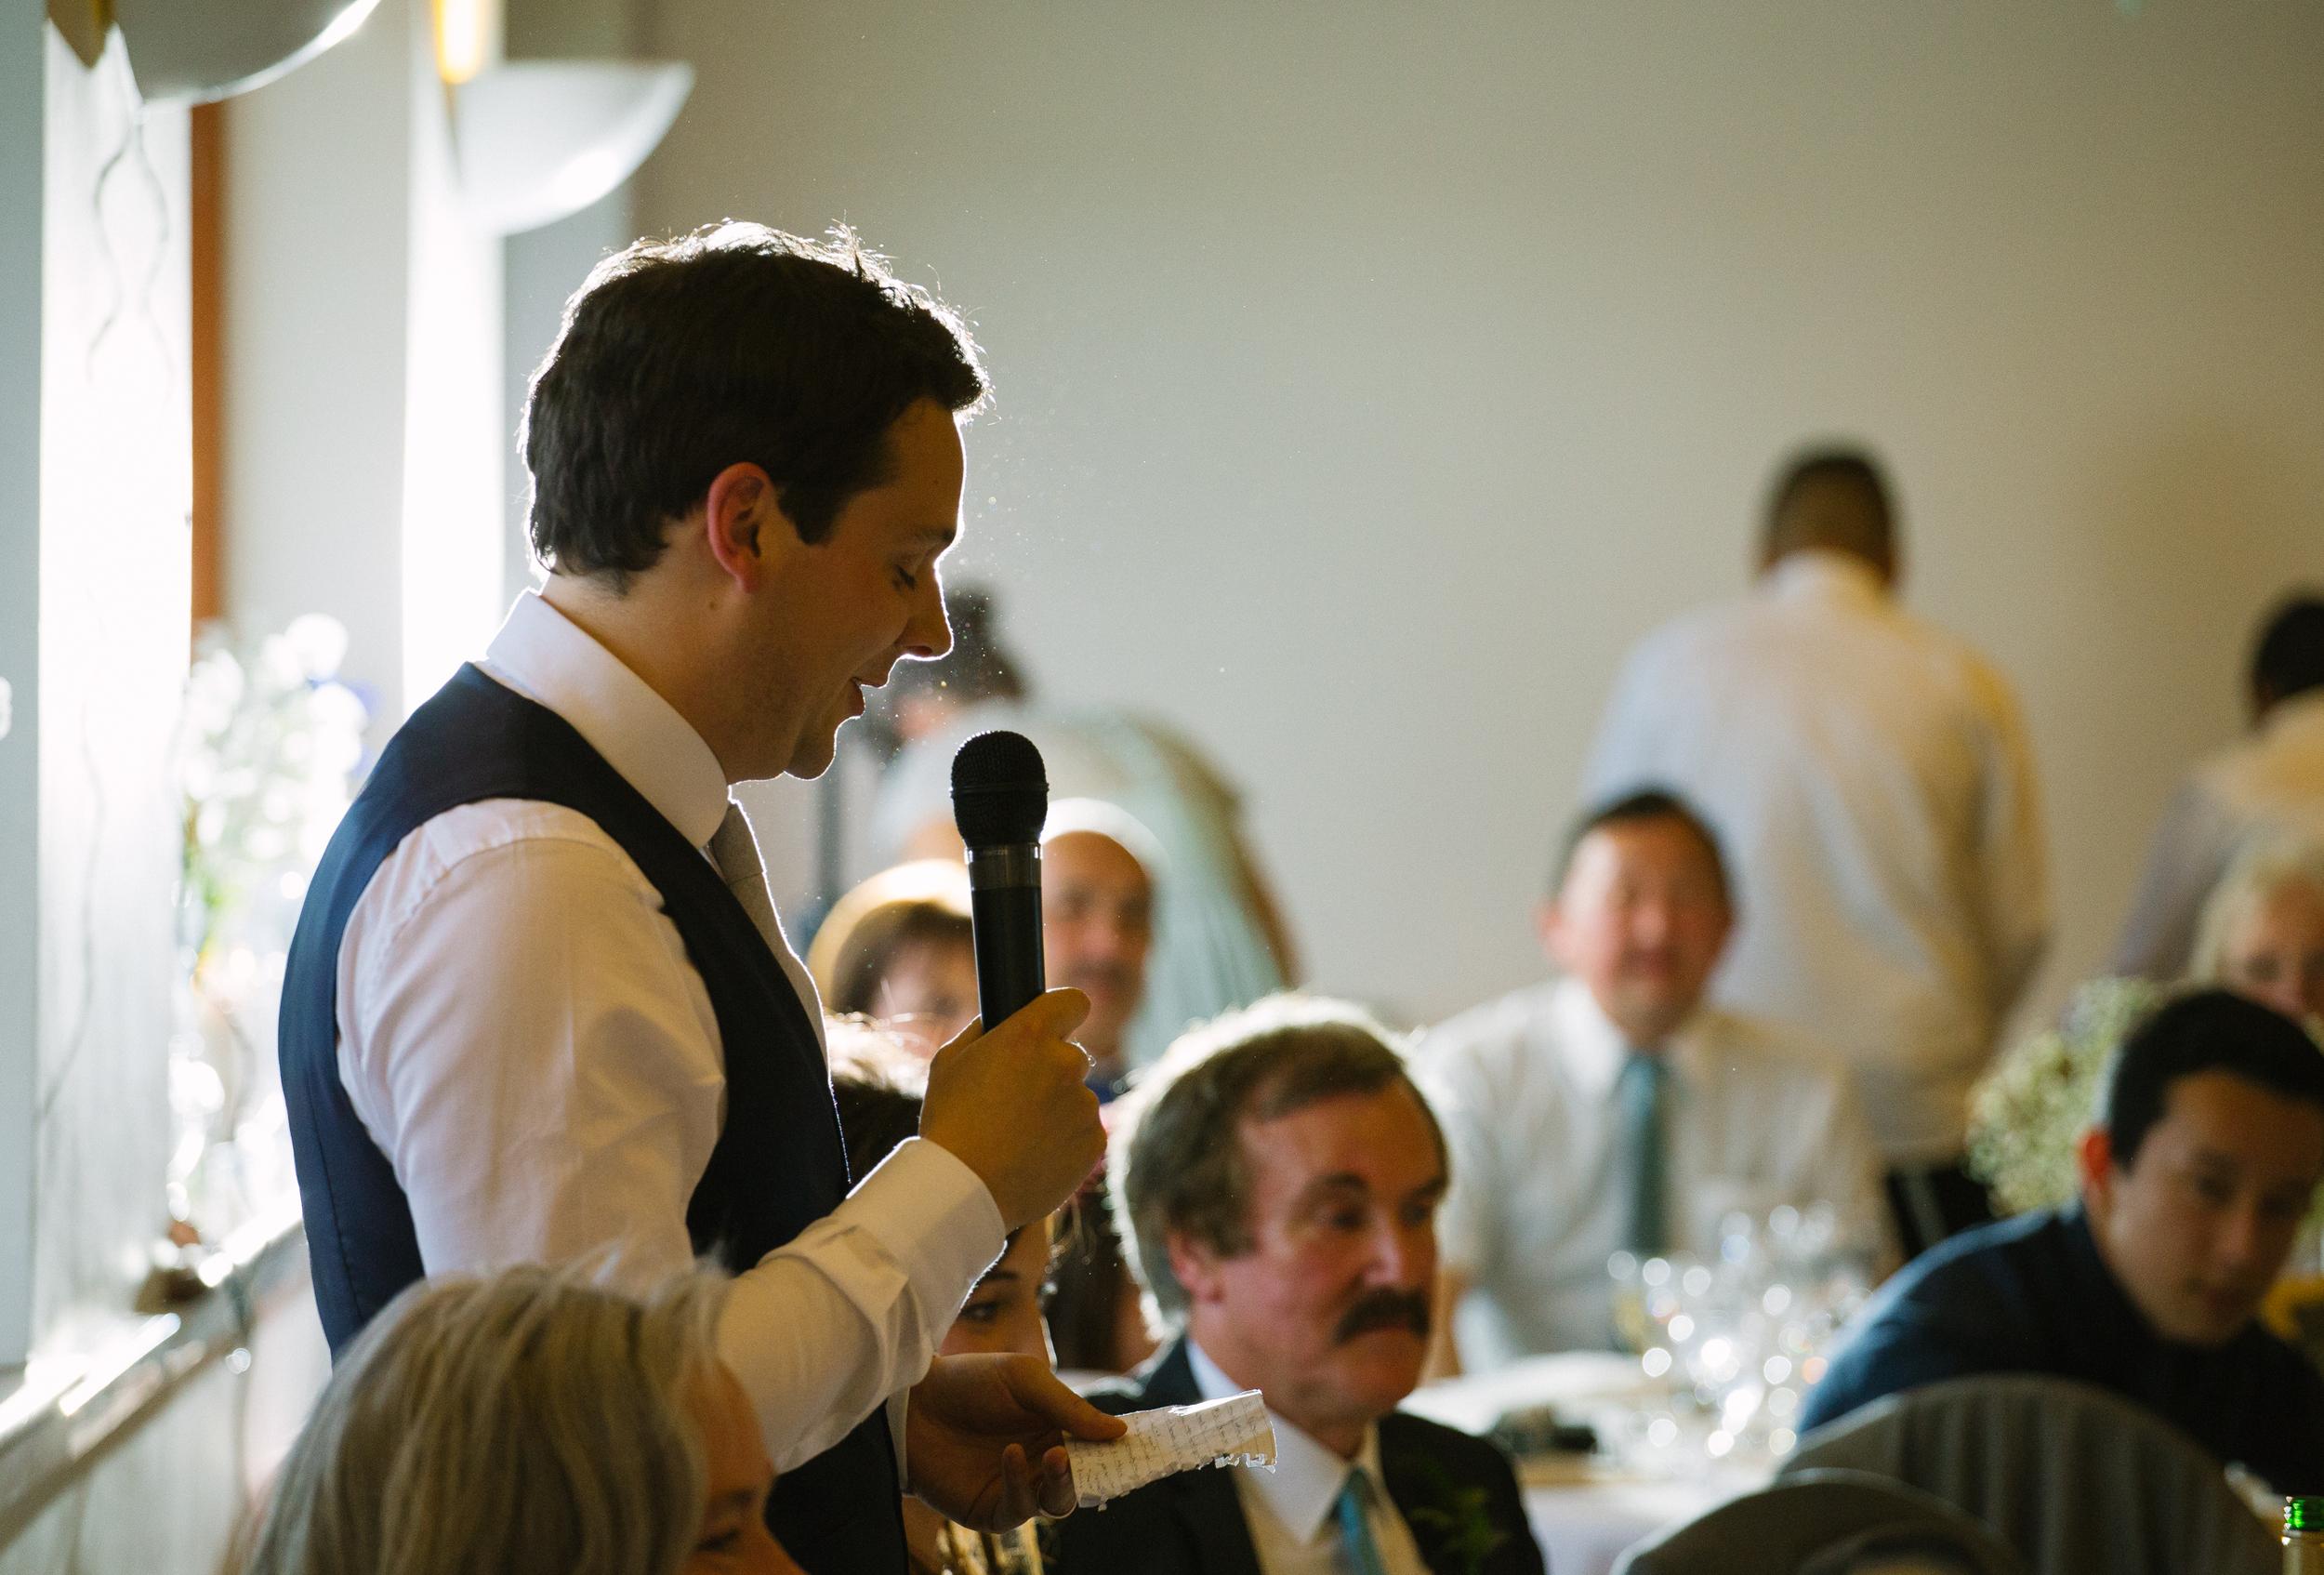 barnes-speeches-london-uk-destination-wedding-photography-Adam-Rowley